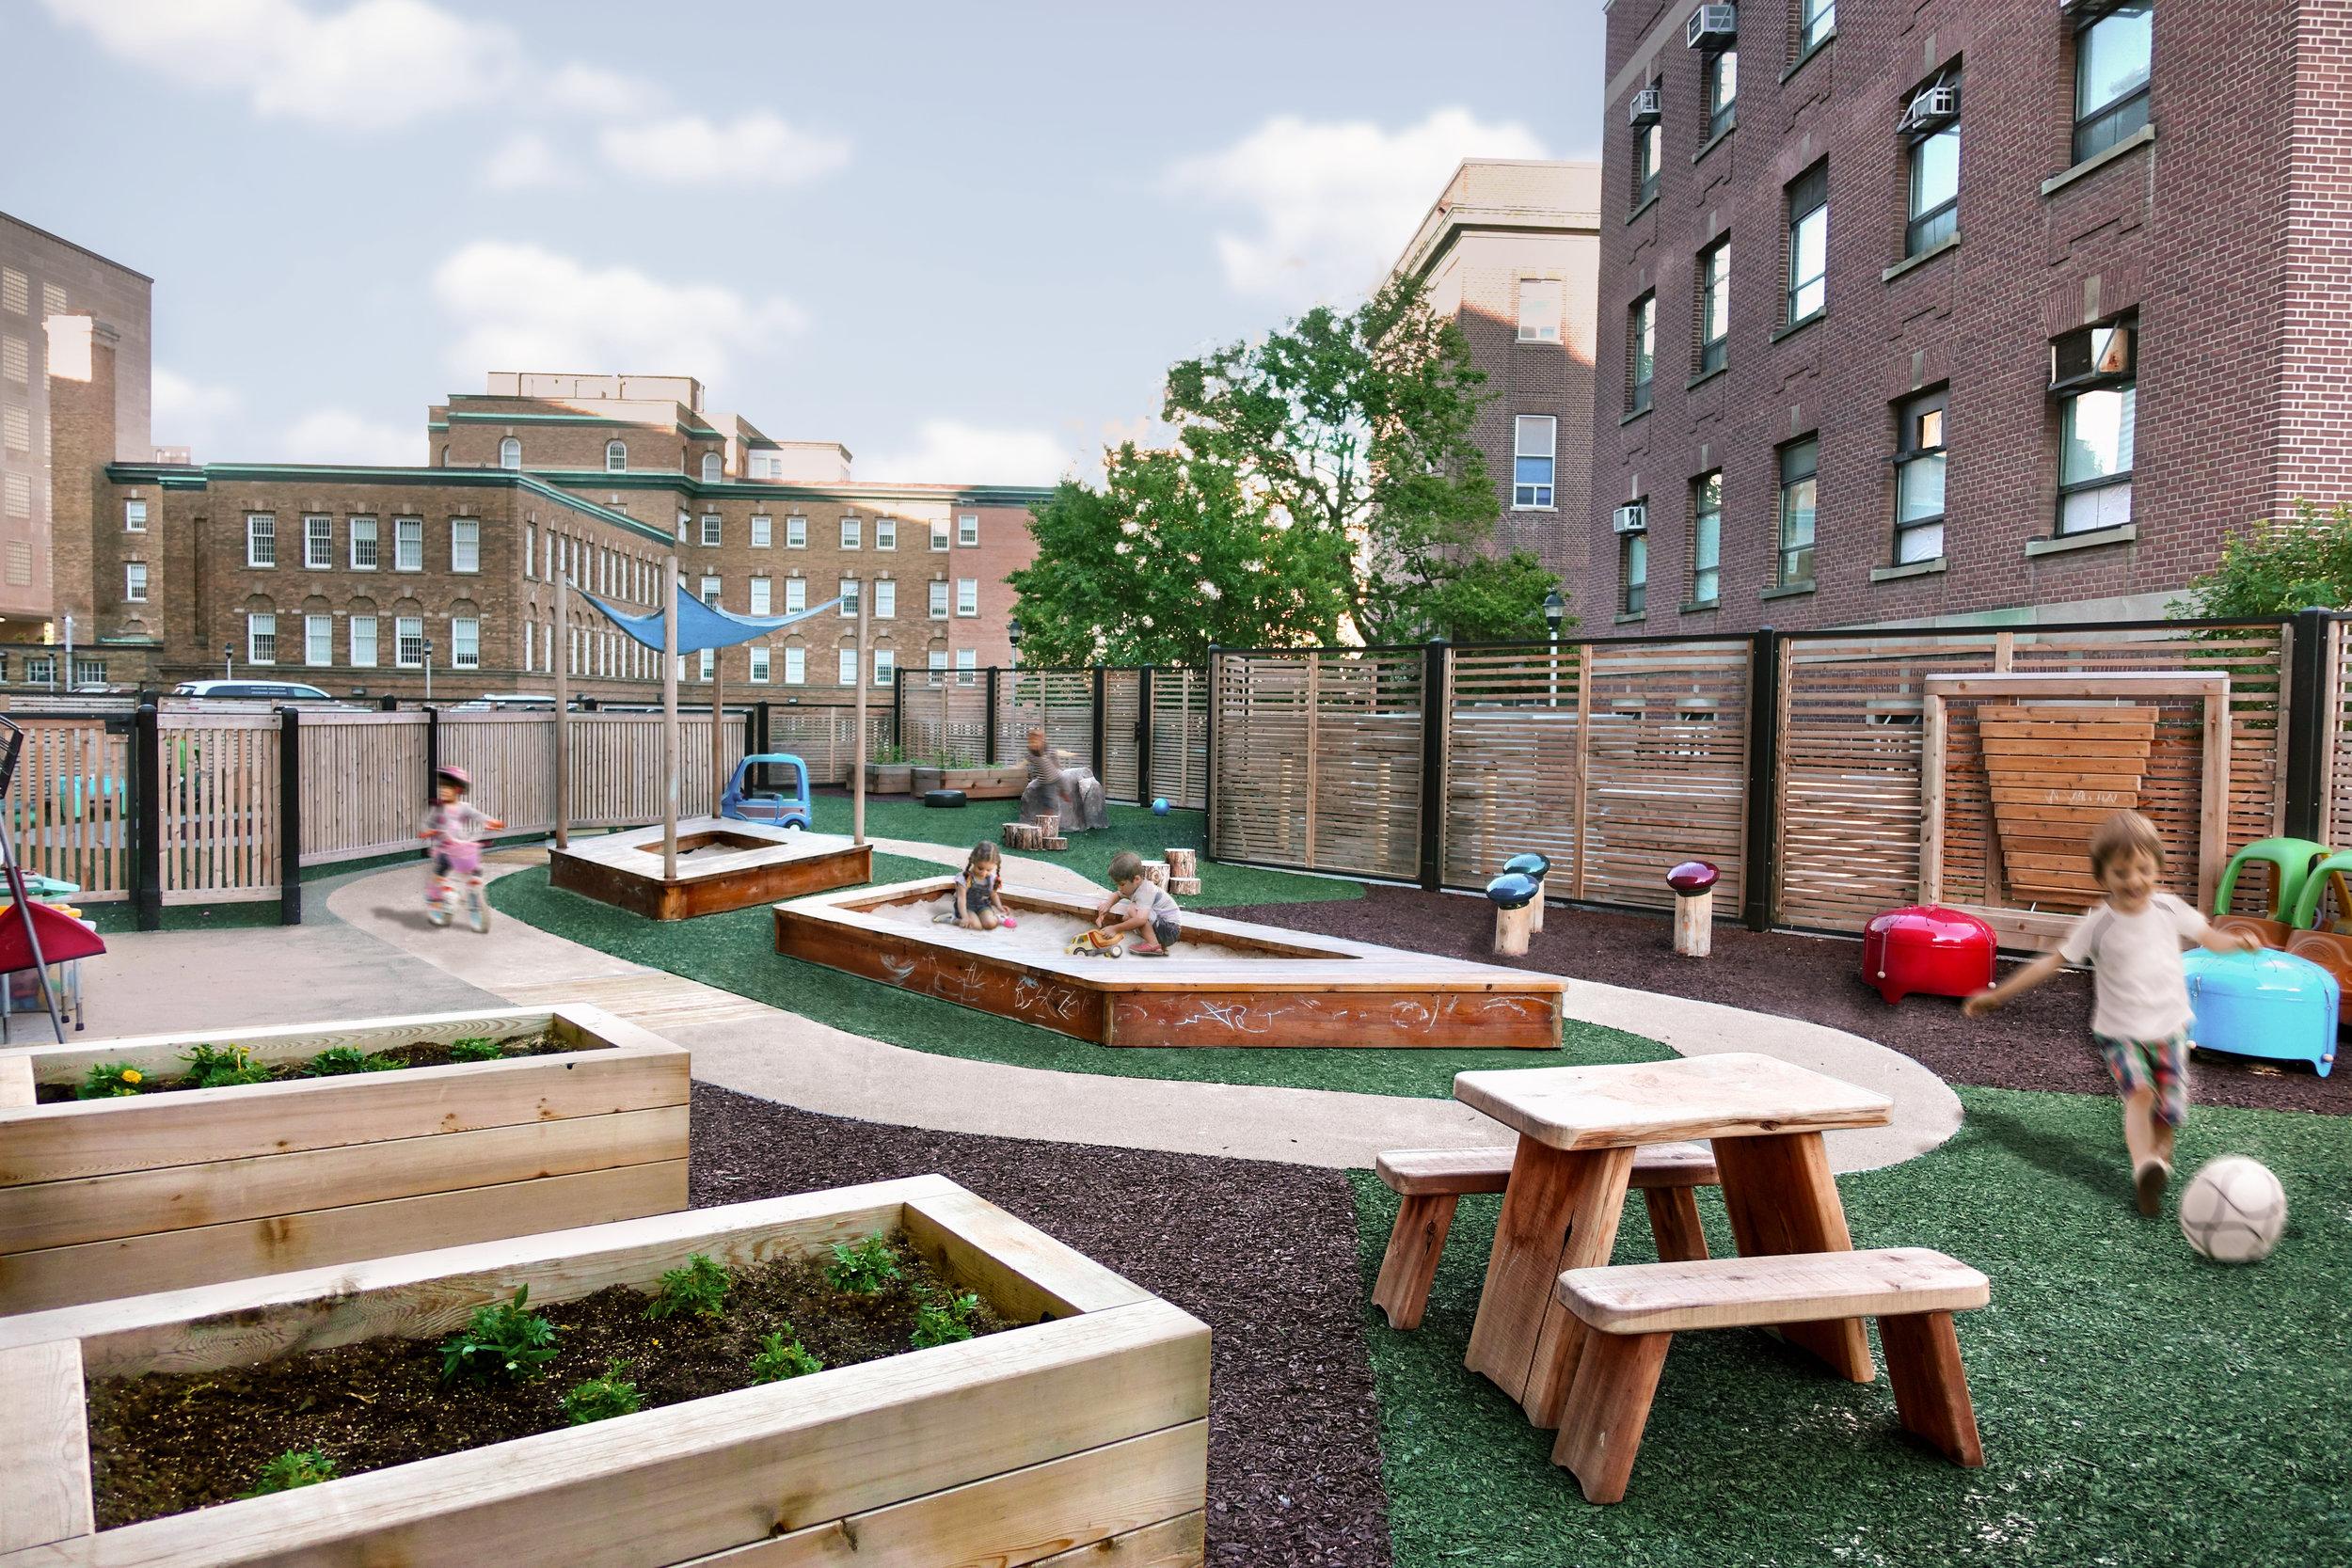 Canada Toronto daycare childcare design Queenspark playground.jpg